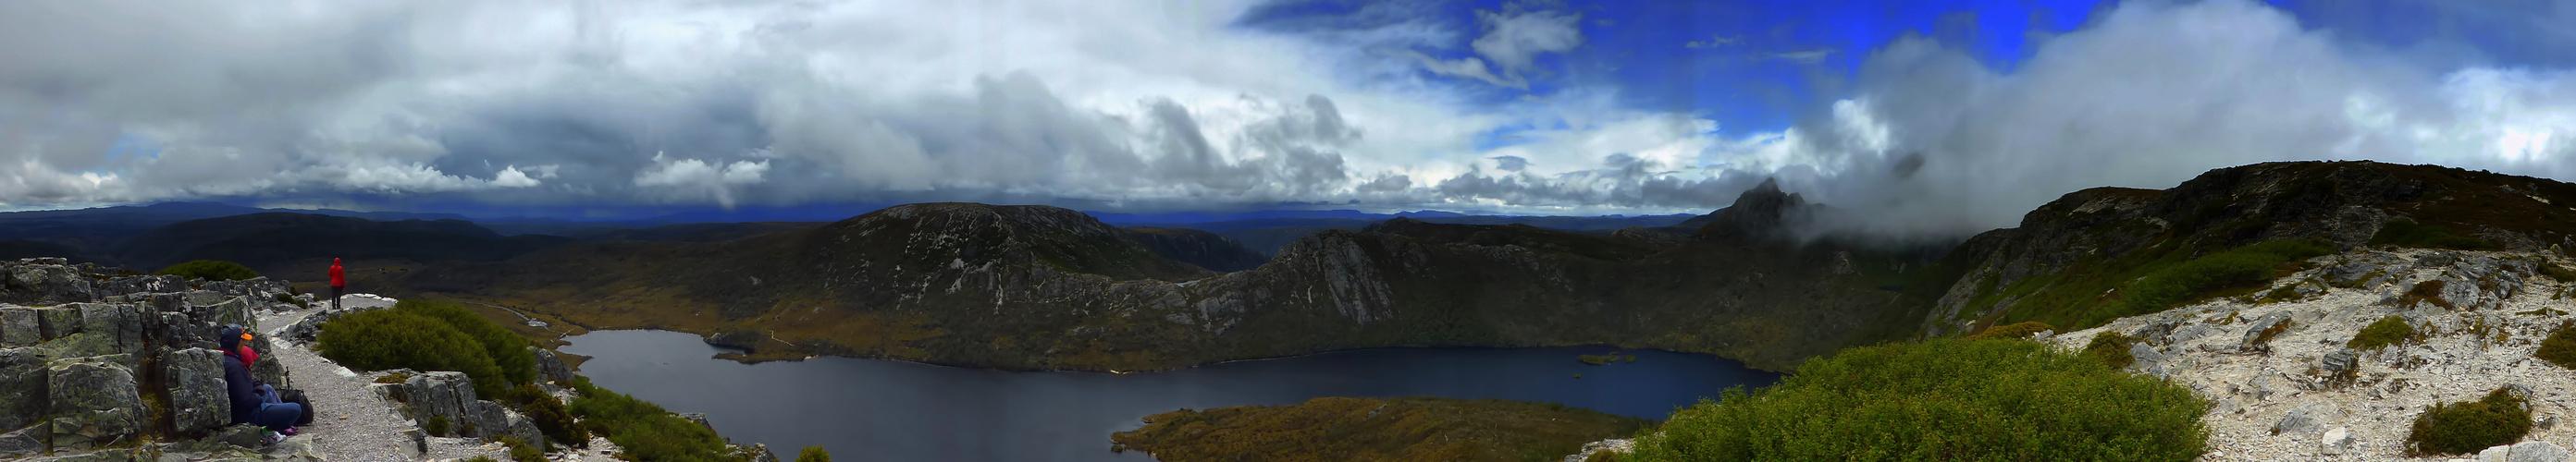 tasmanian solitude IV